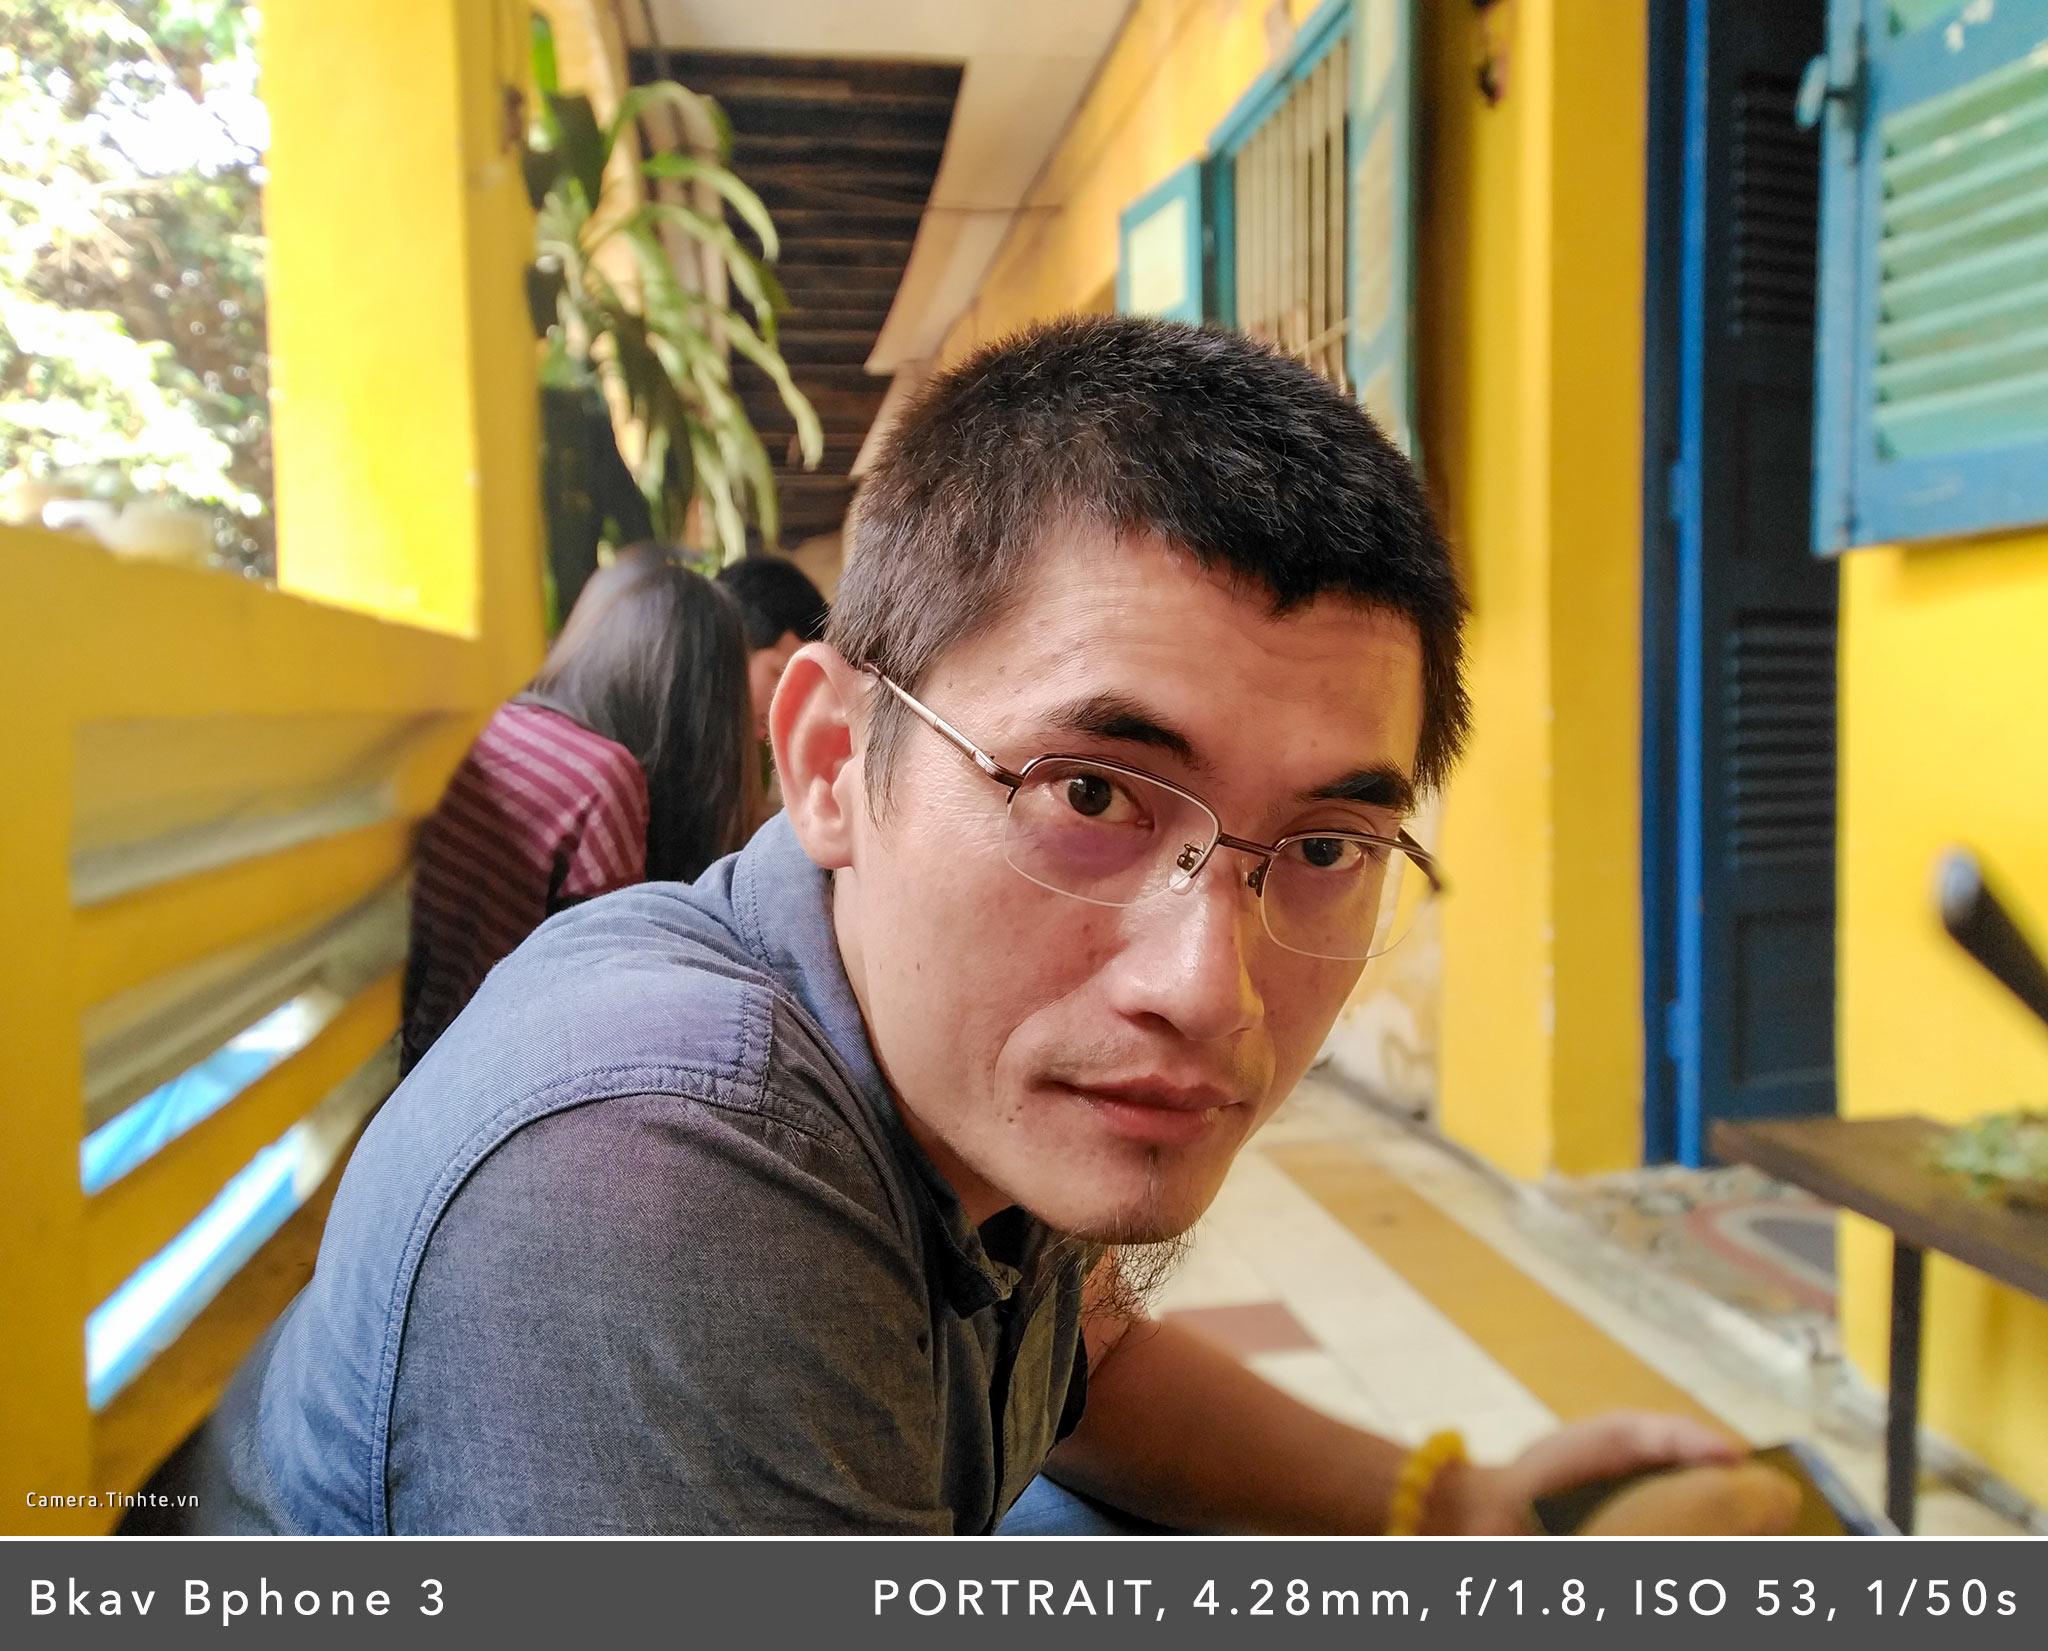 Camera.Tinhte.vn_Bphone-3_PORTRAIT_IMG_20181010_090610.jpg